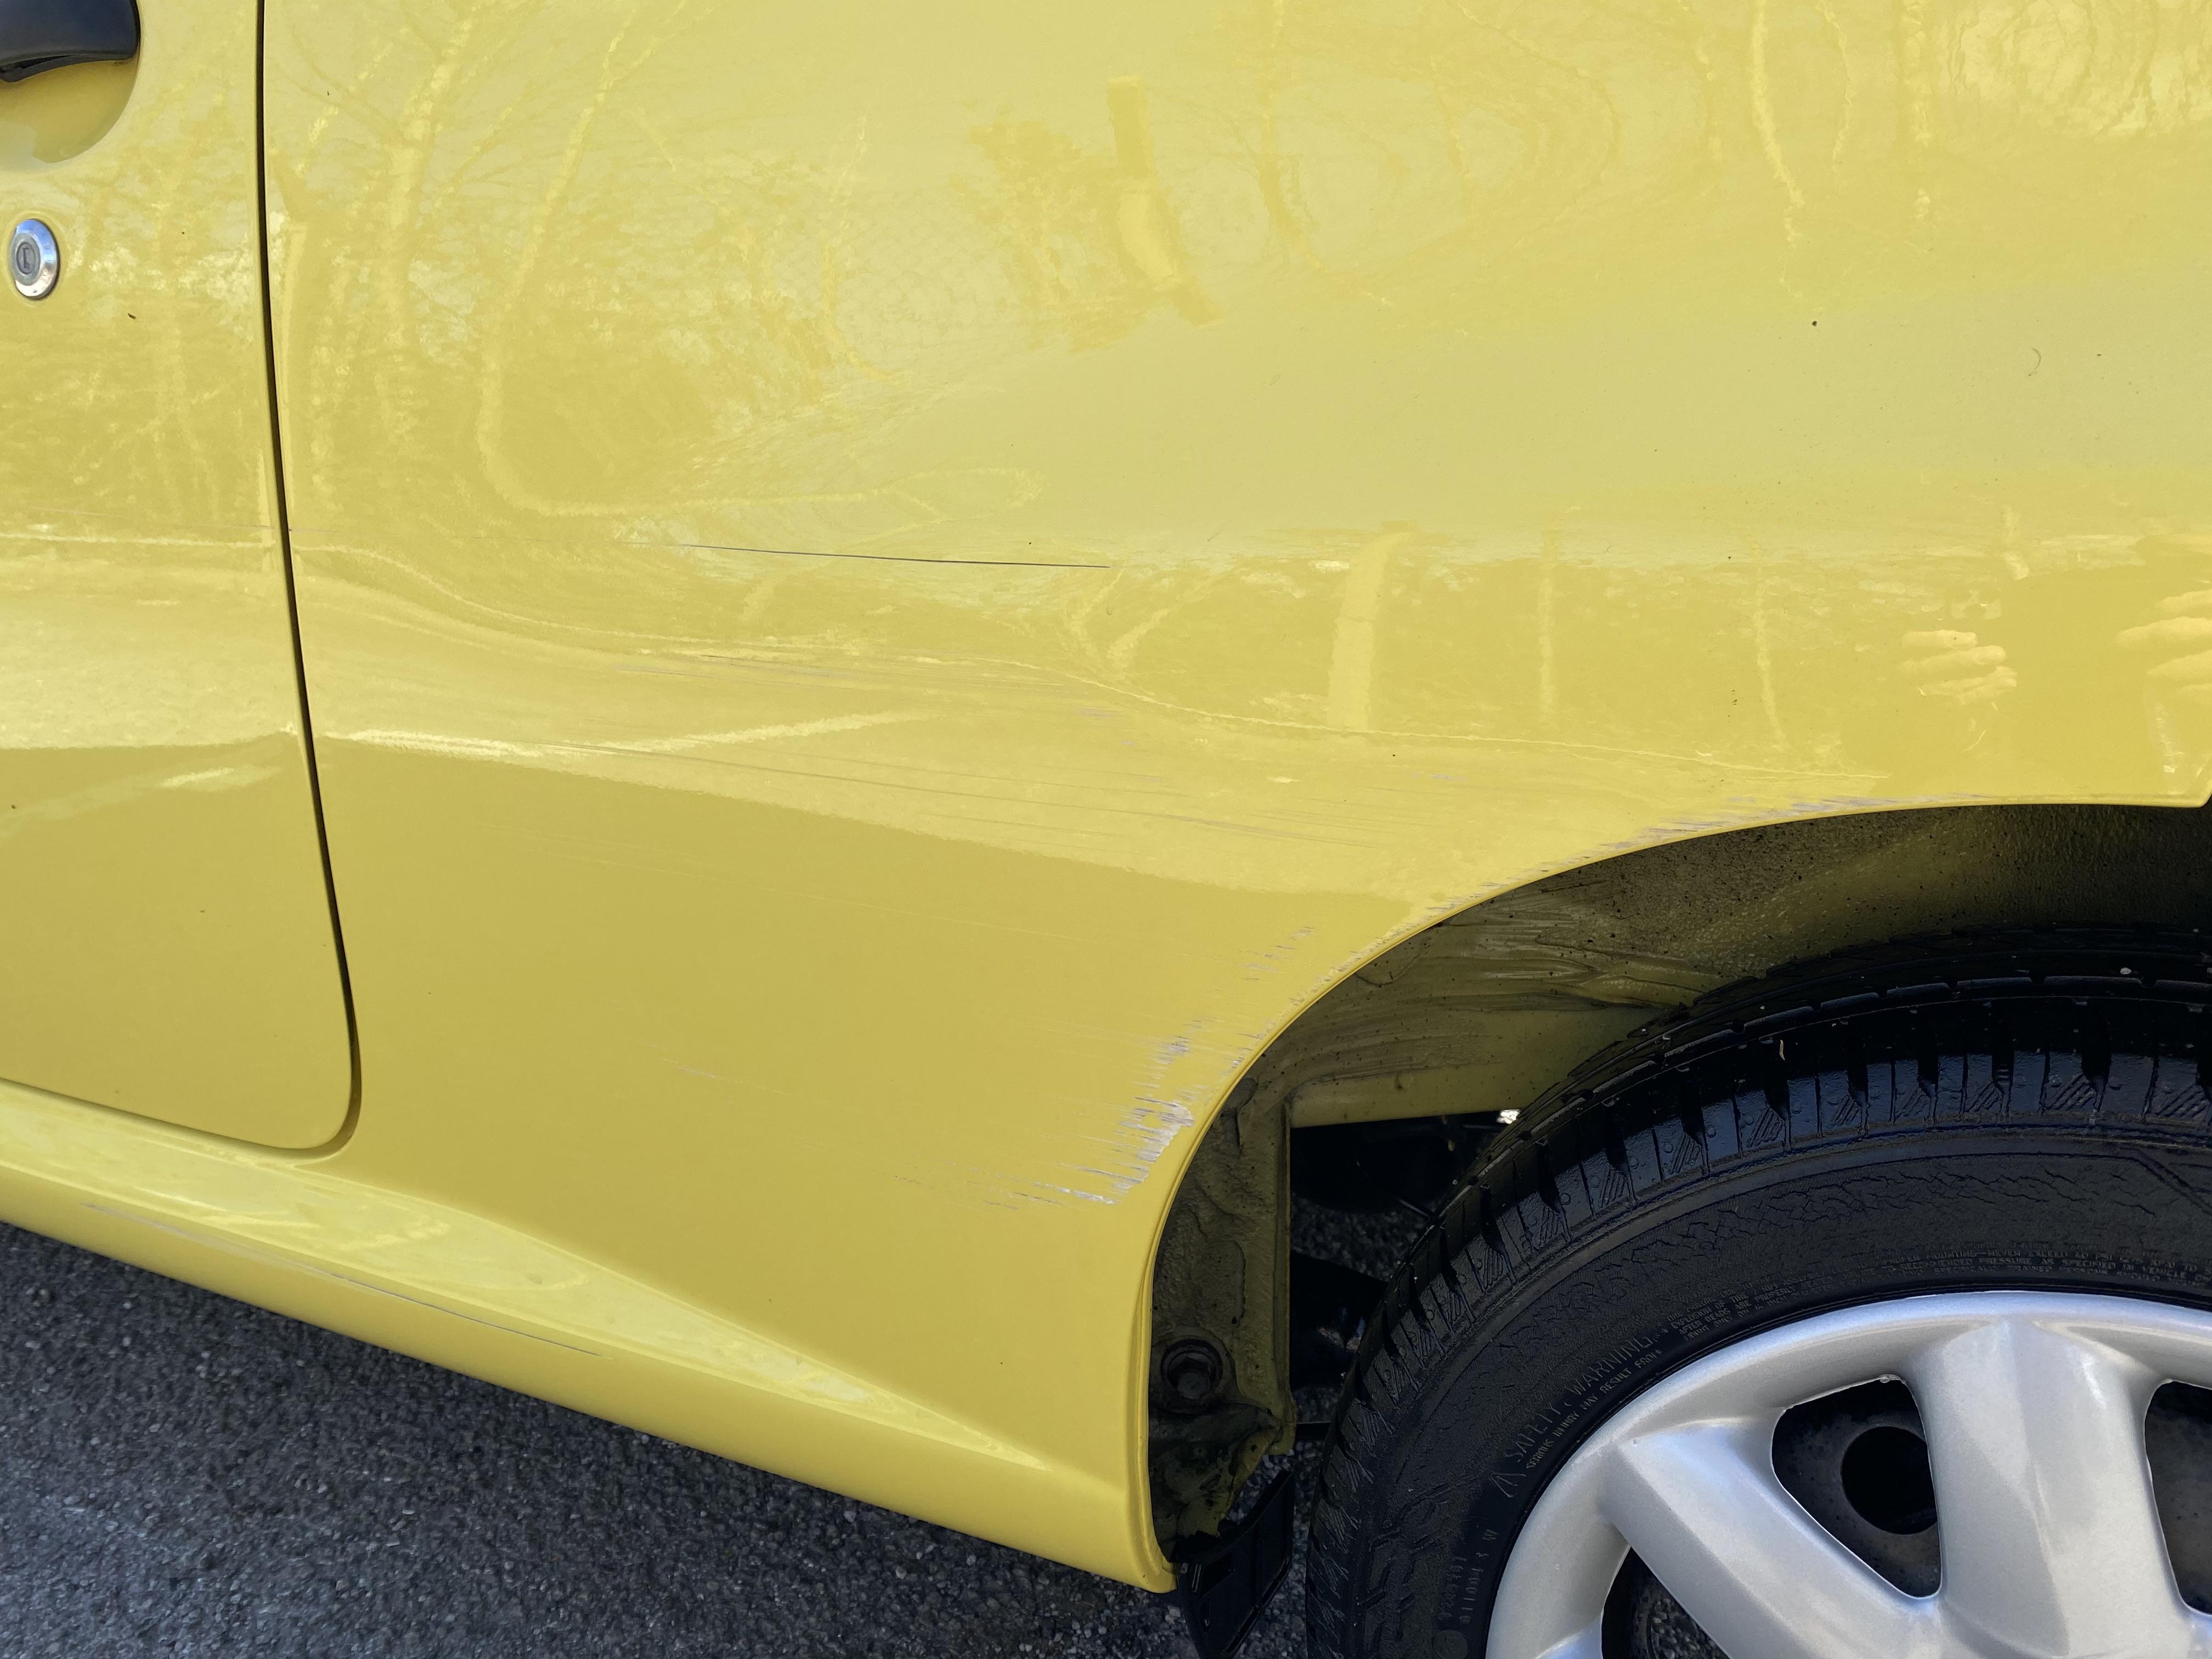 [MA61 KPU] 2011 Peugeot 107 1.0 Urban Lite 3-door hatchback in Yellow, 9,167 Miles, MOT expired - Image 7 of 7